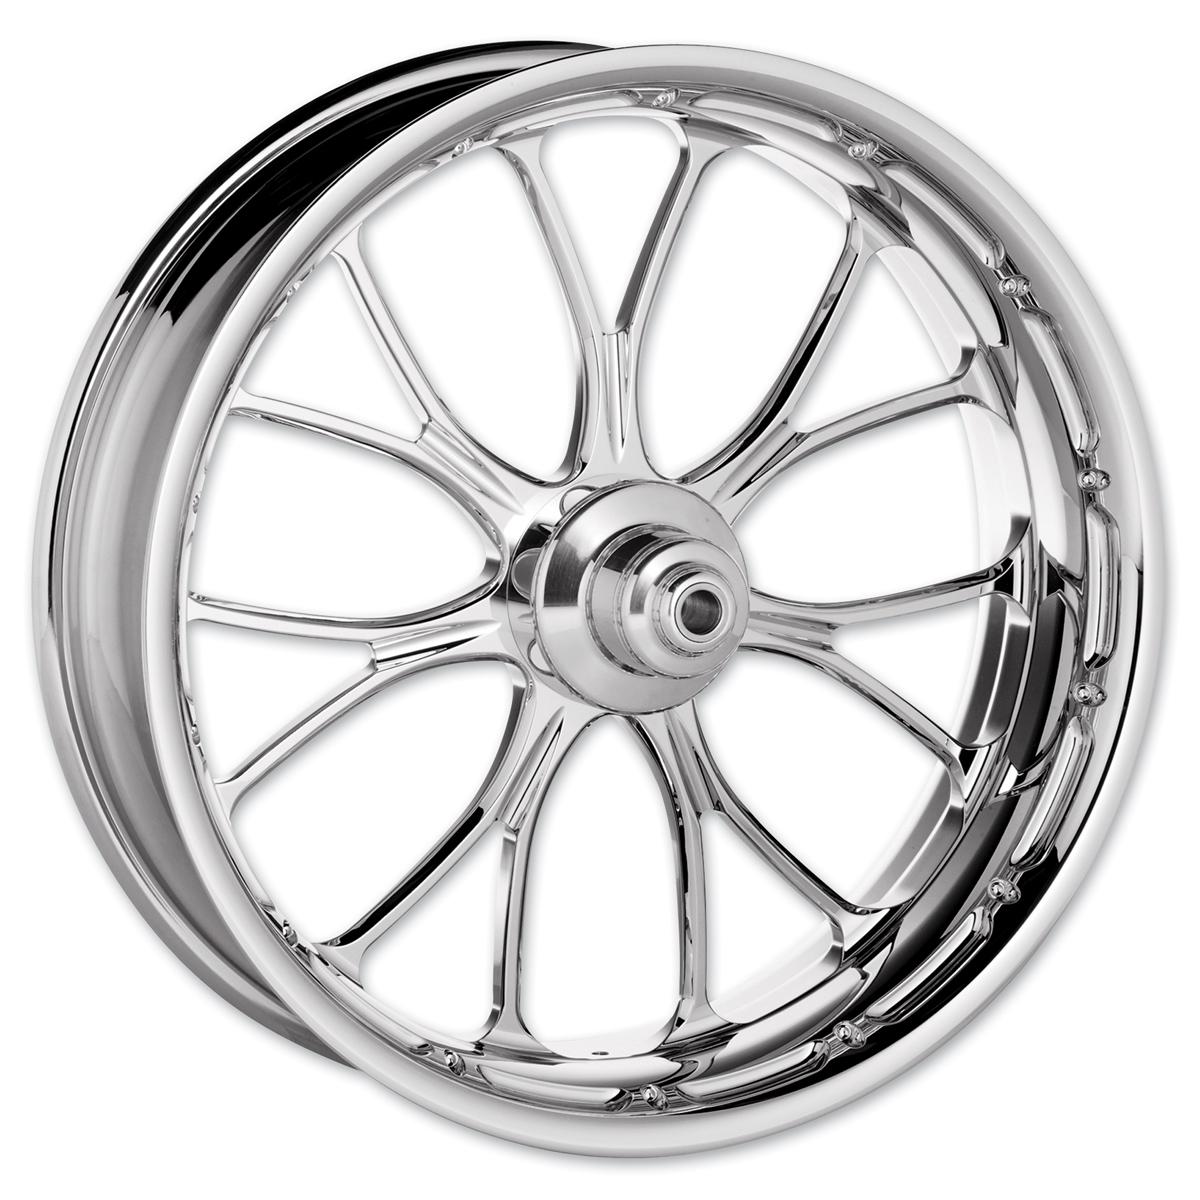 Performance Machine Heathen Chrome Front Wheel 21x3.5 ABS